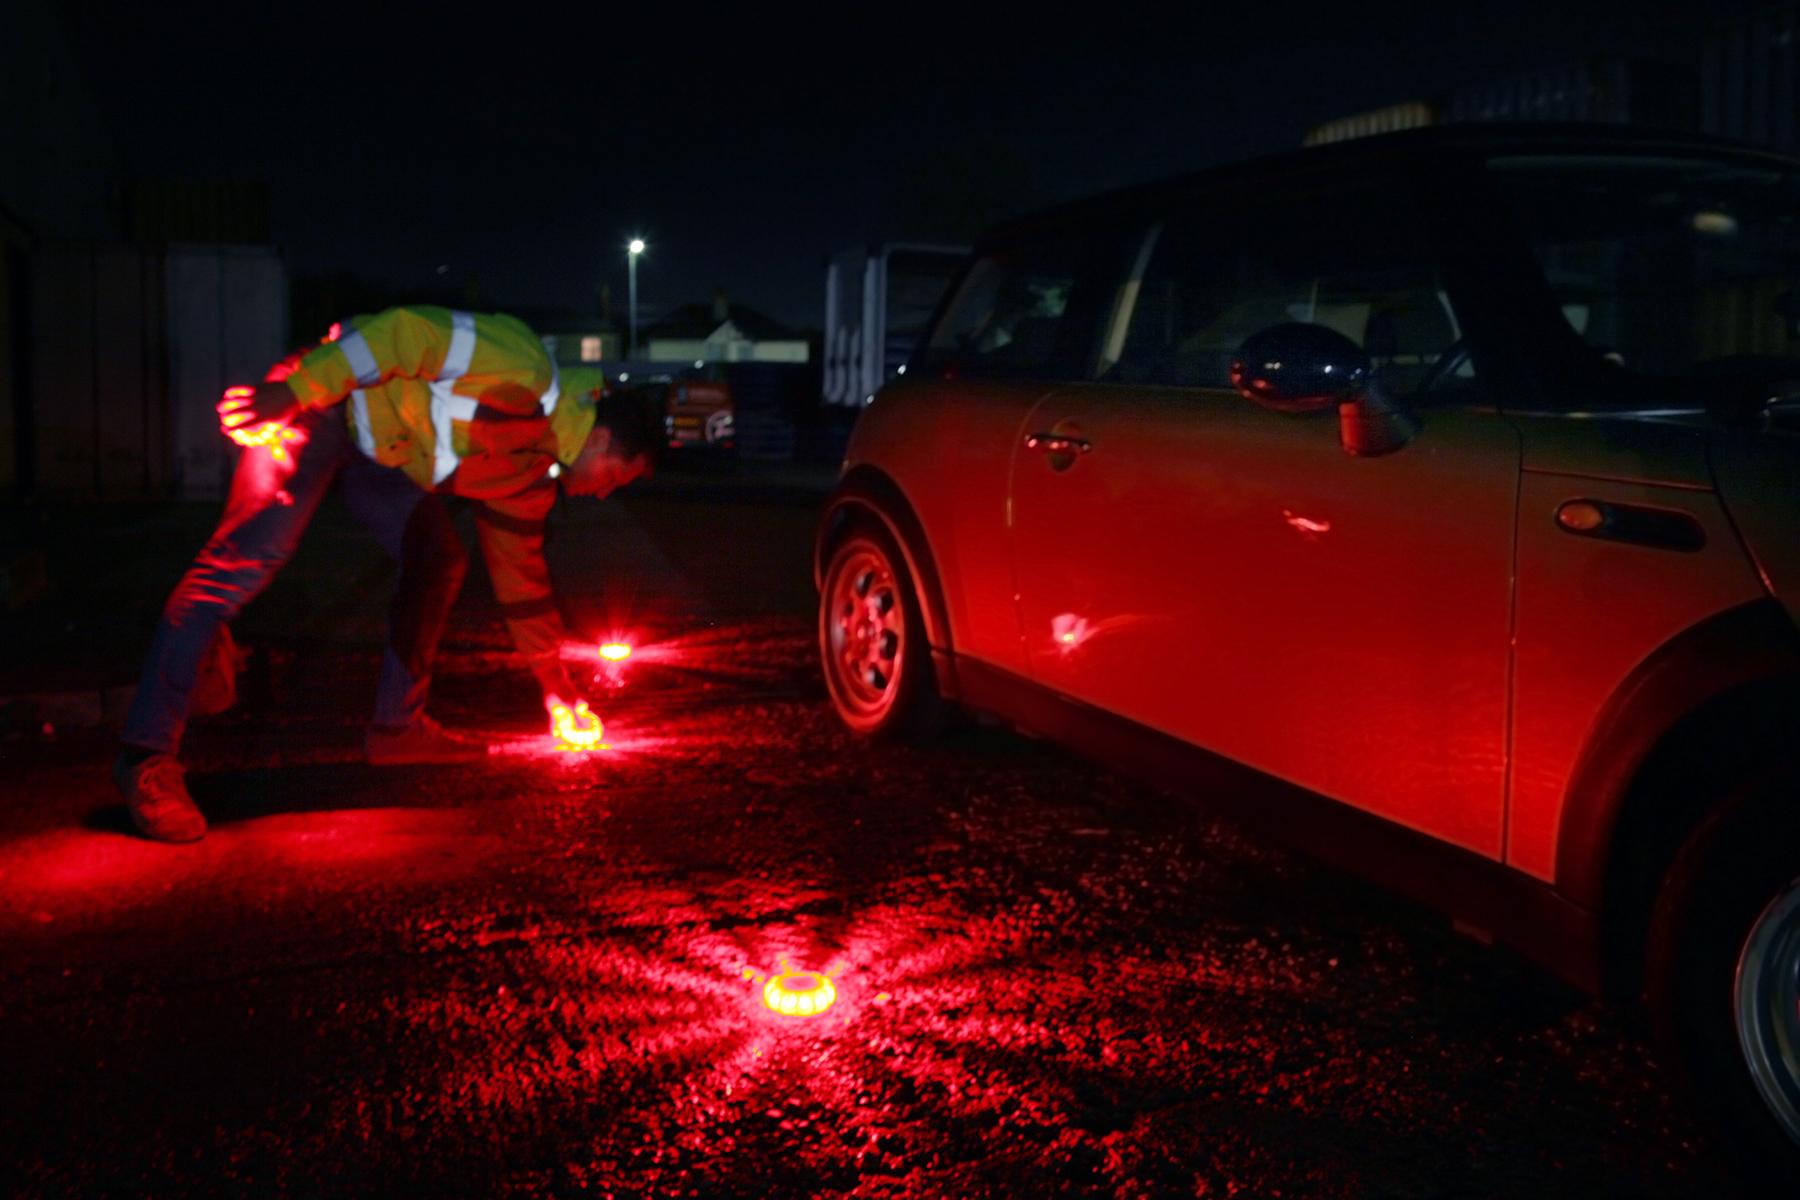 Nordstrand Magnetic Car Vehicle Breakdown Hazard Warning